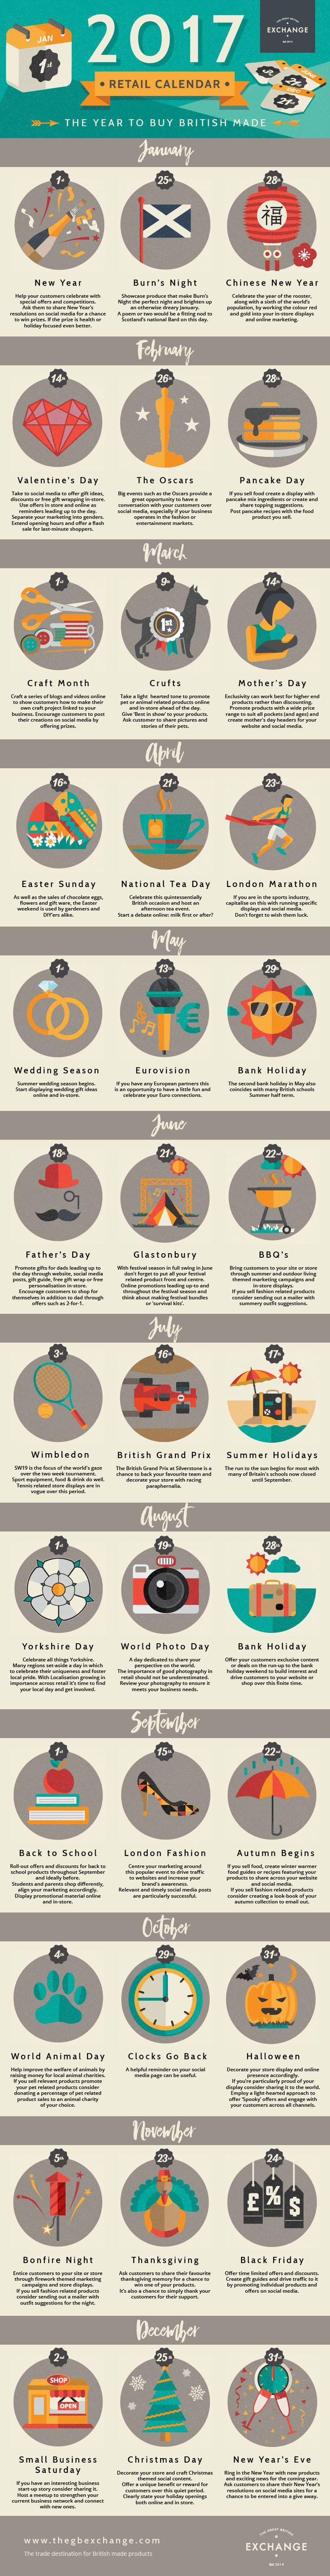 infographic, digital marketing, business, B2B, retail, British, email marketing #holiday, artisan, locally made